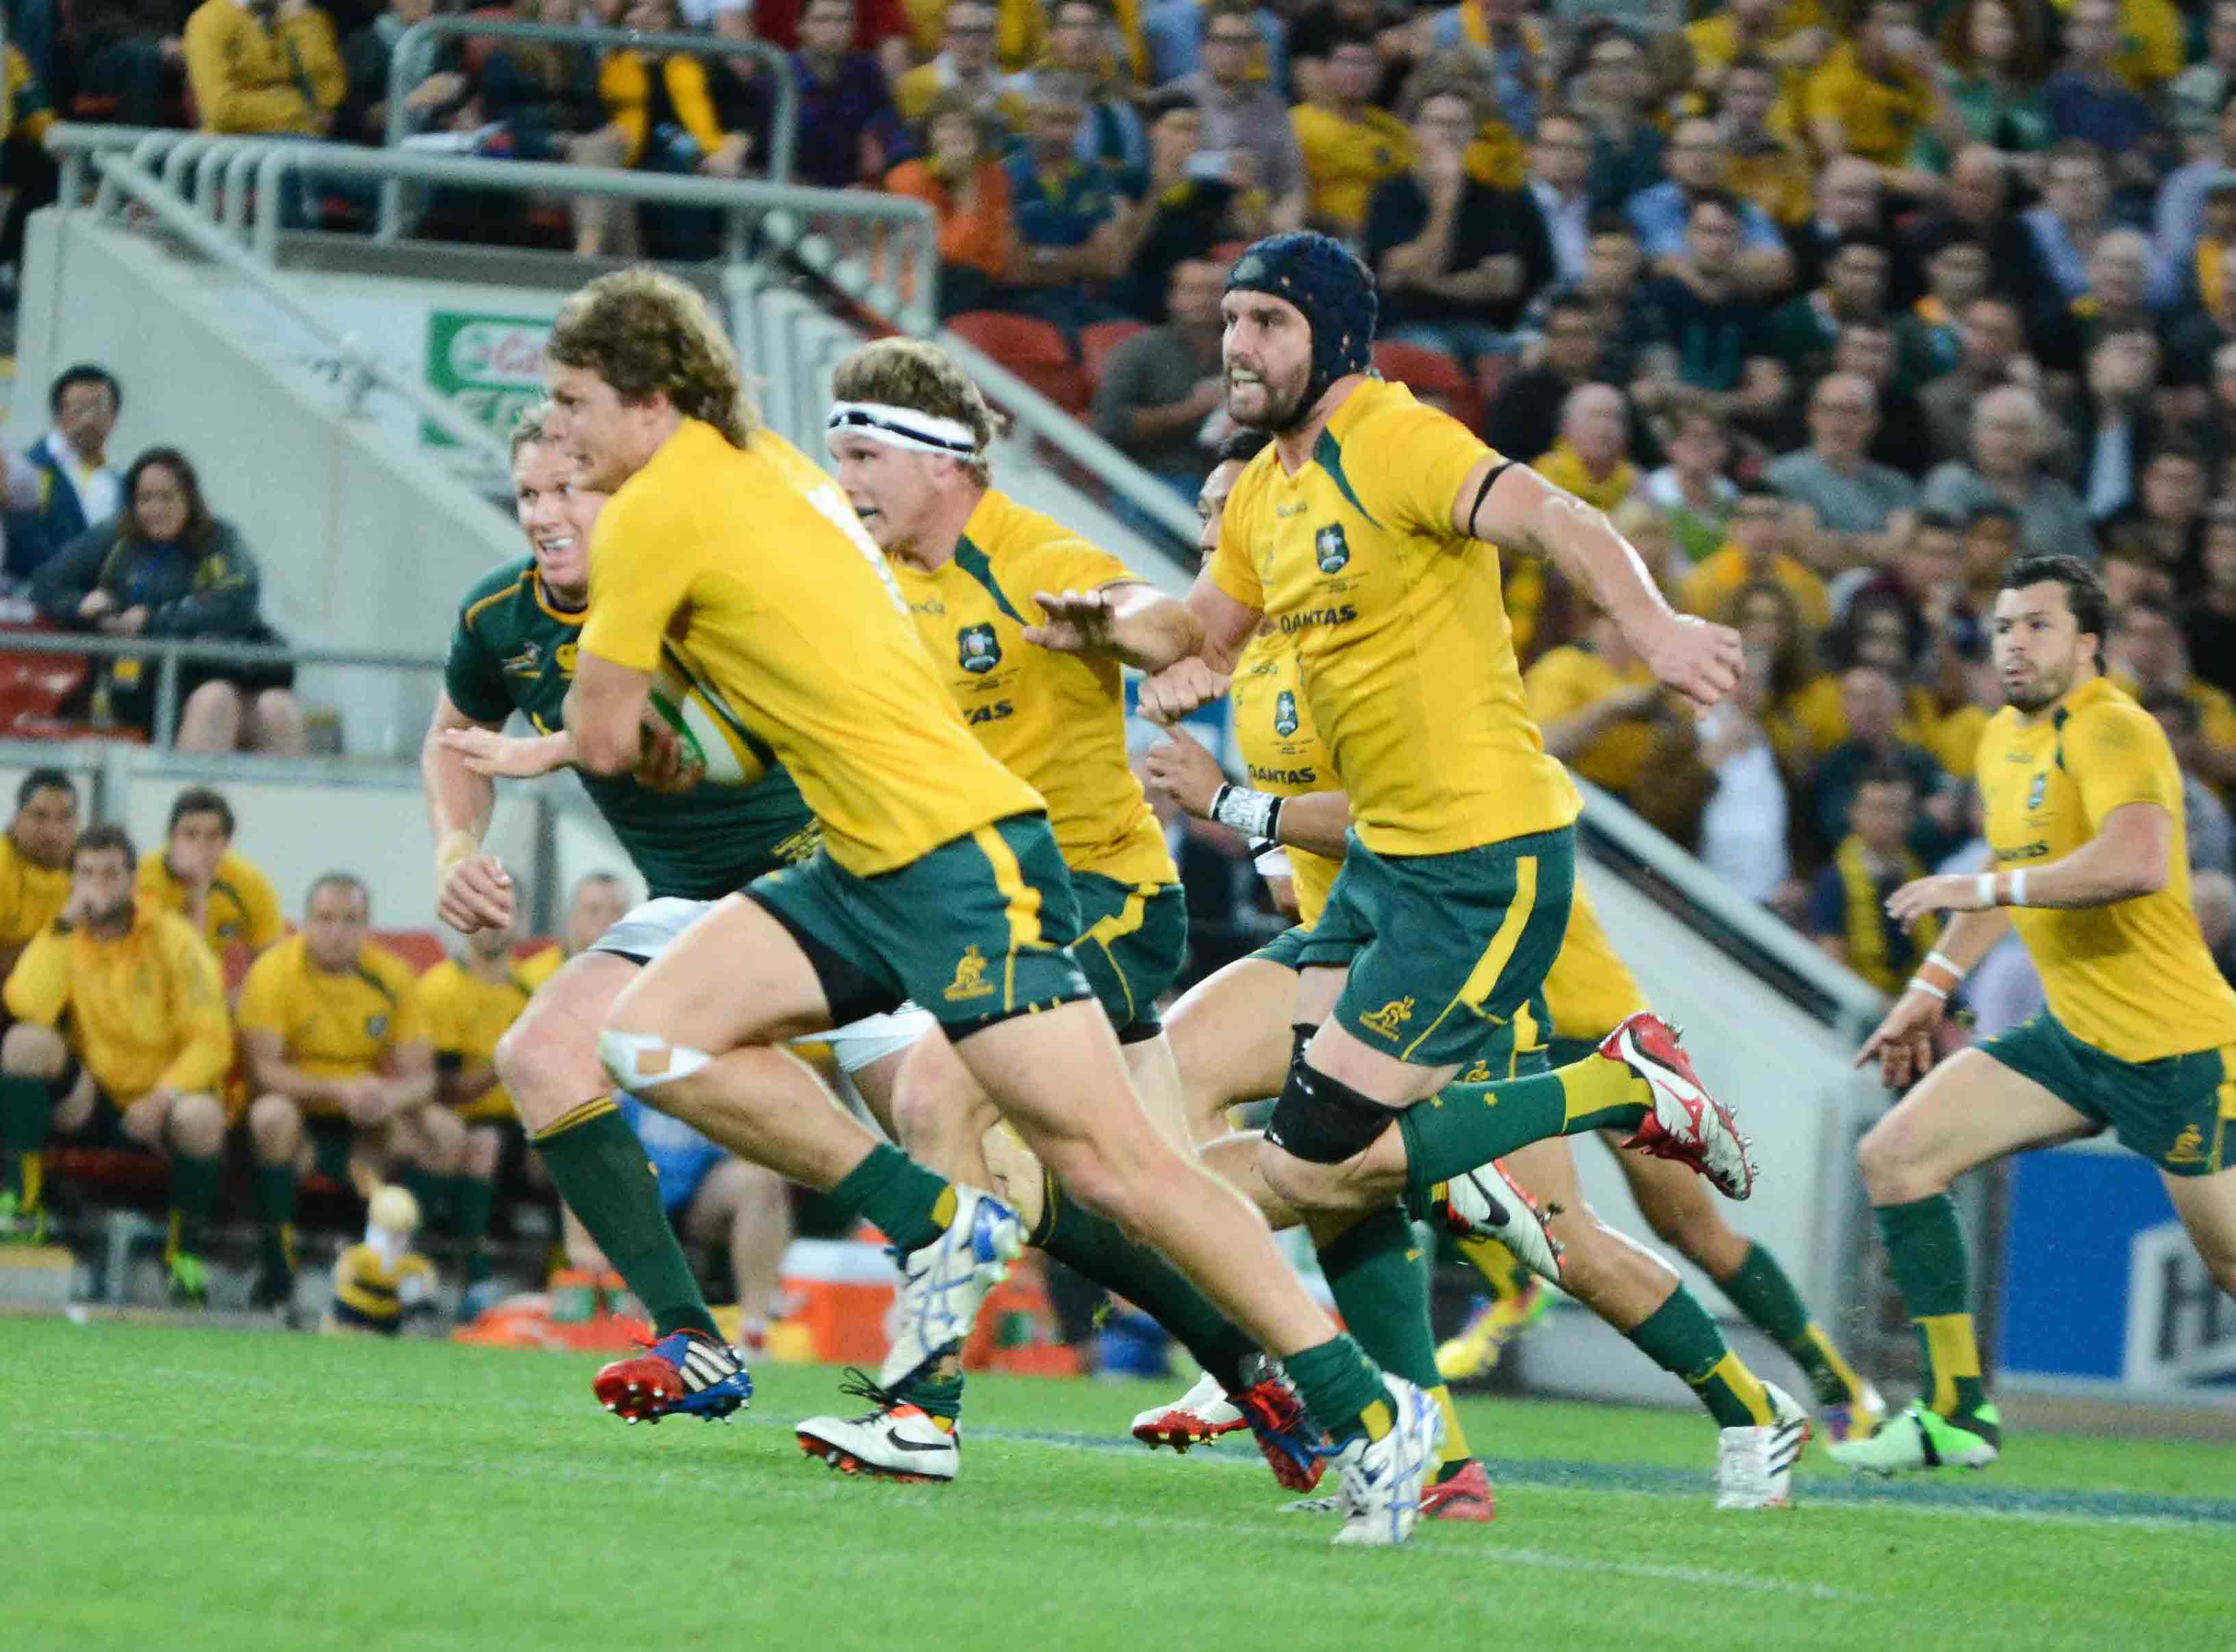 Wallabies-v-Springbok-Brisbane-2013-9-of-34